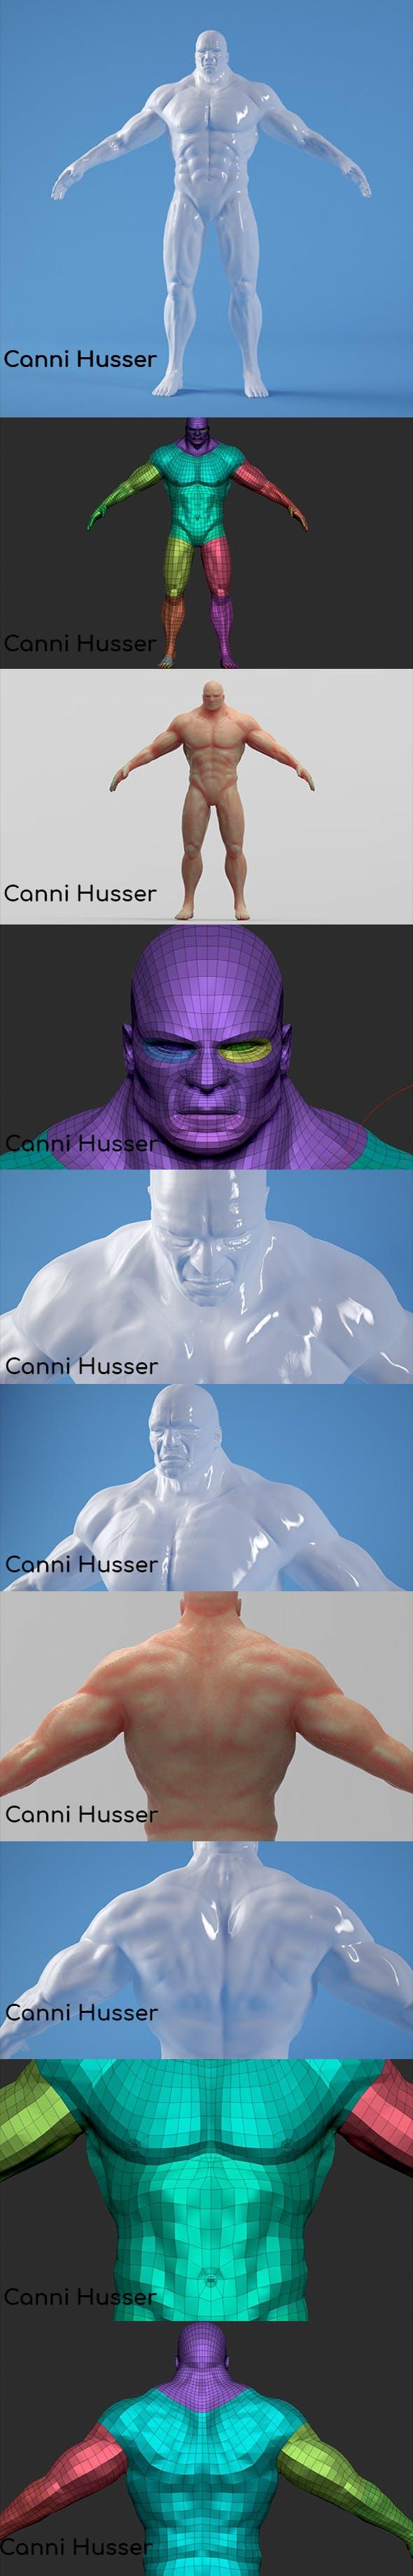 Body Man - 3DOcean Item for Sale